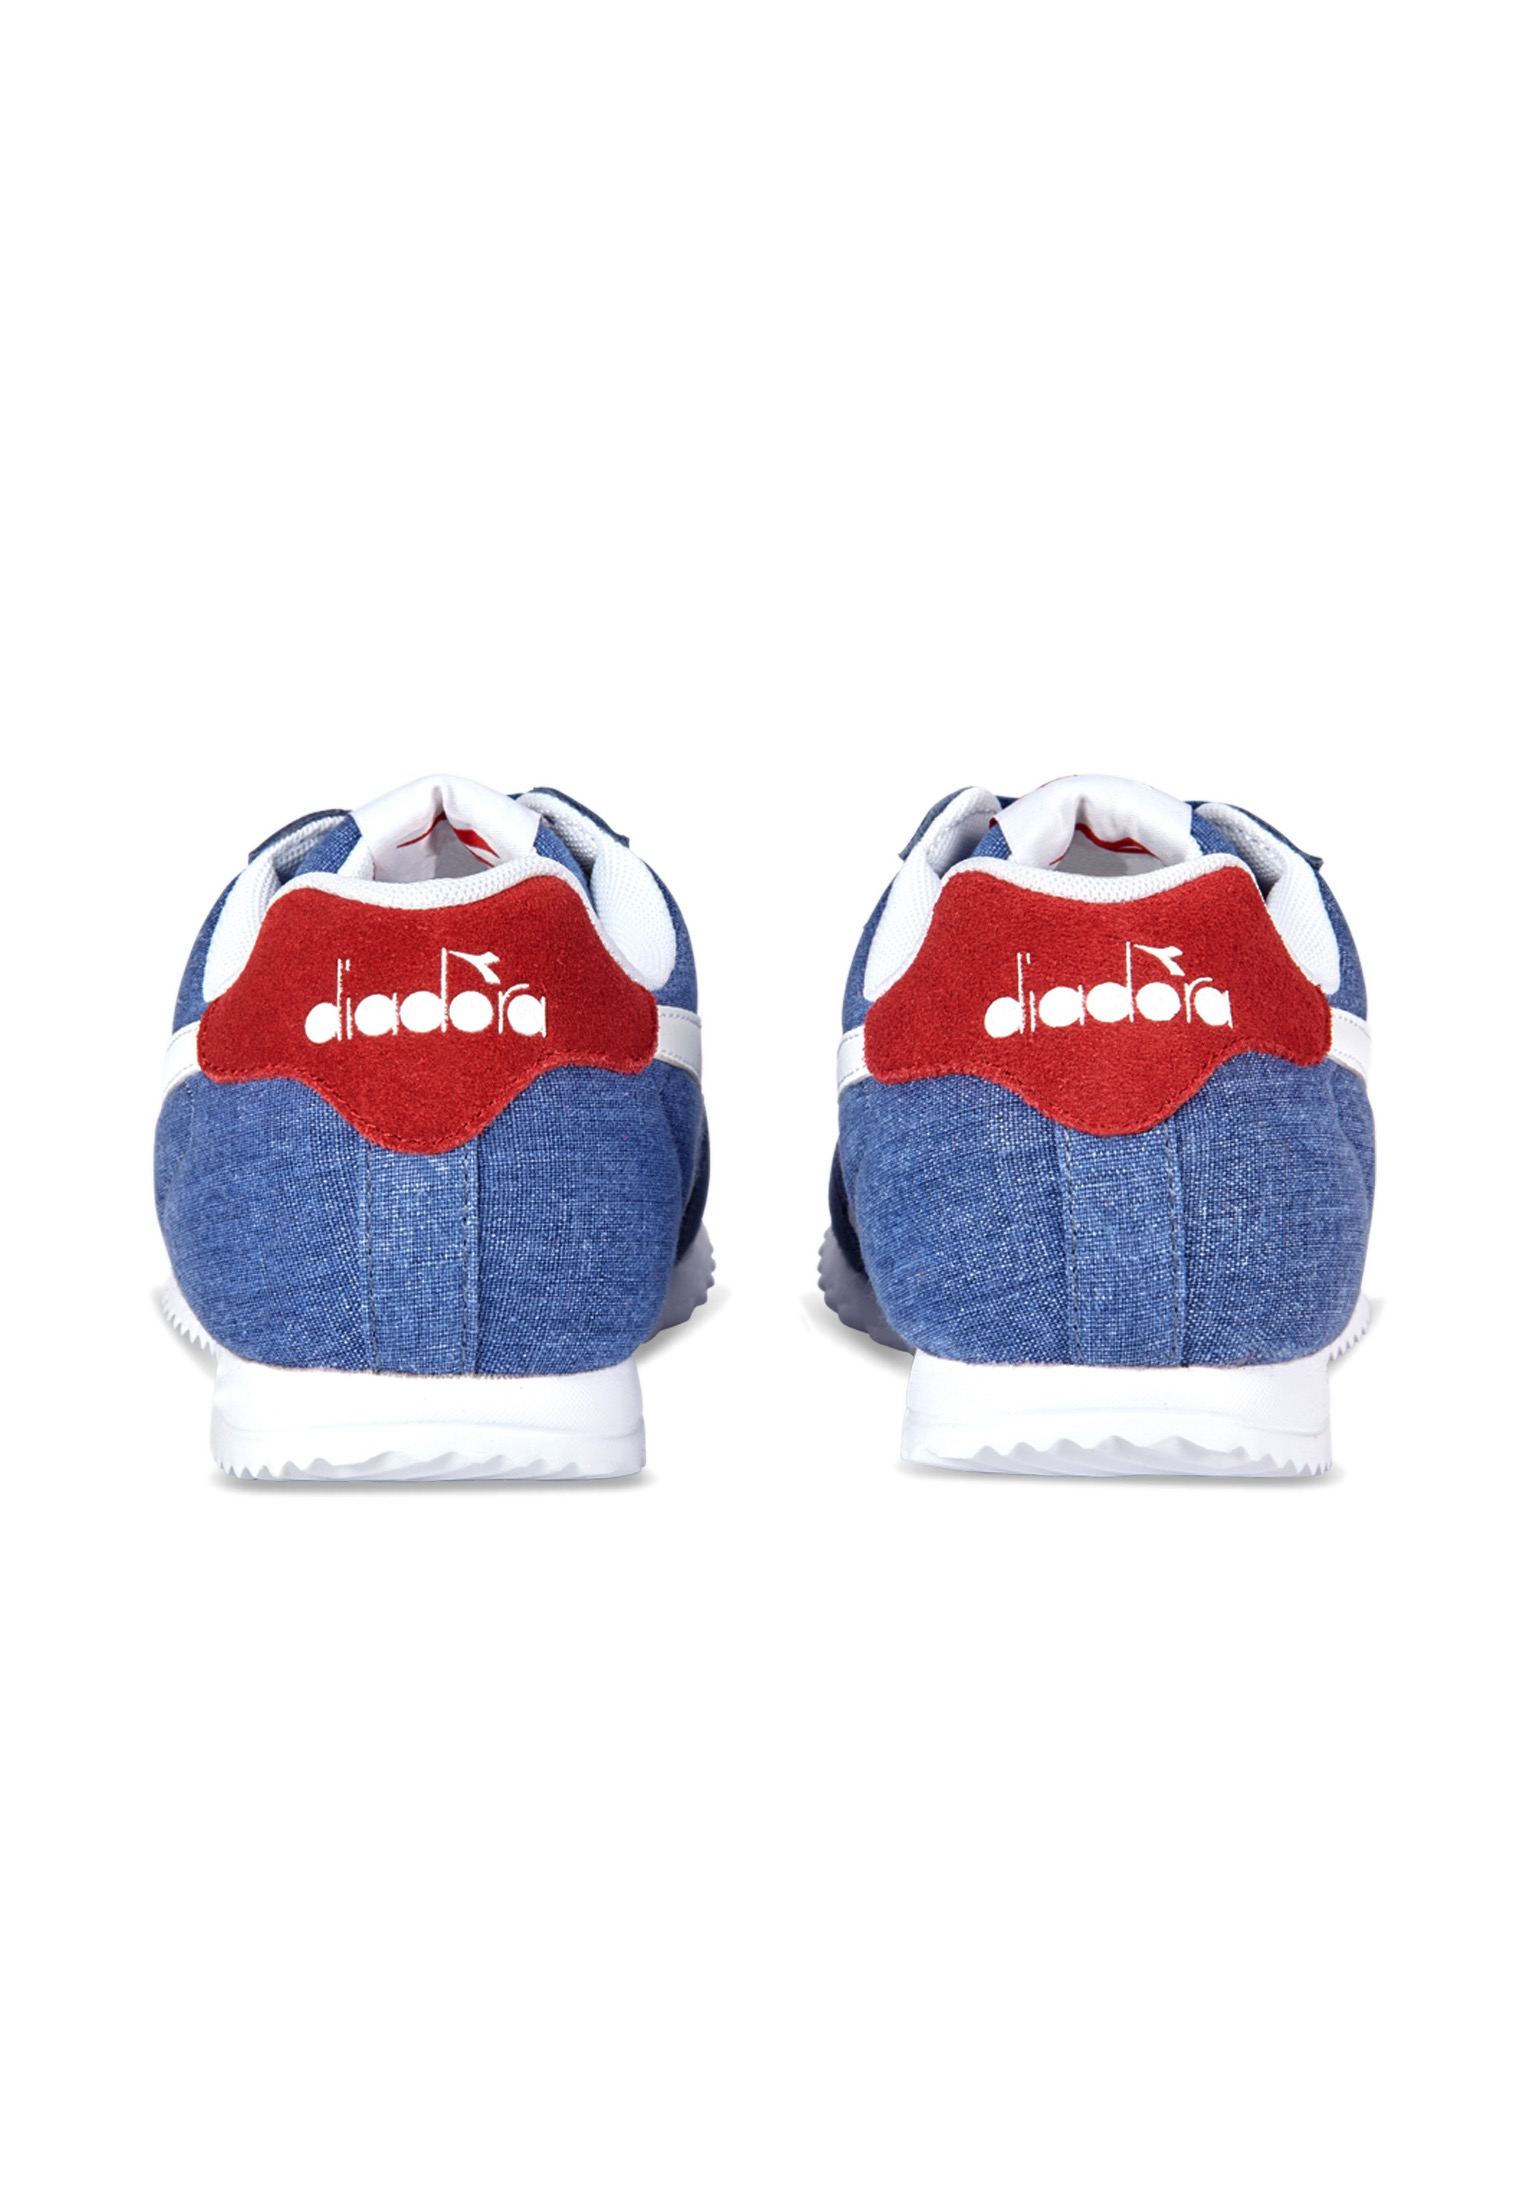 Scarpe-Diadora-Jog-Light-C-Sneakers-sportive-uomo-donna-vari-colori-e-taglie miniatura 36